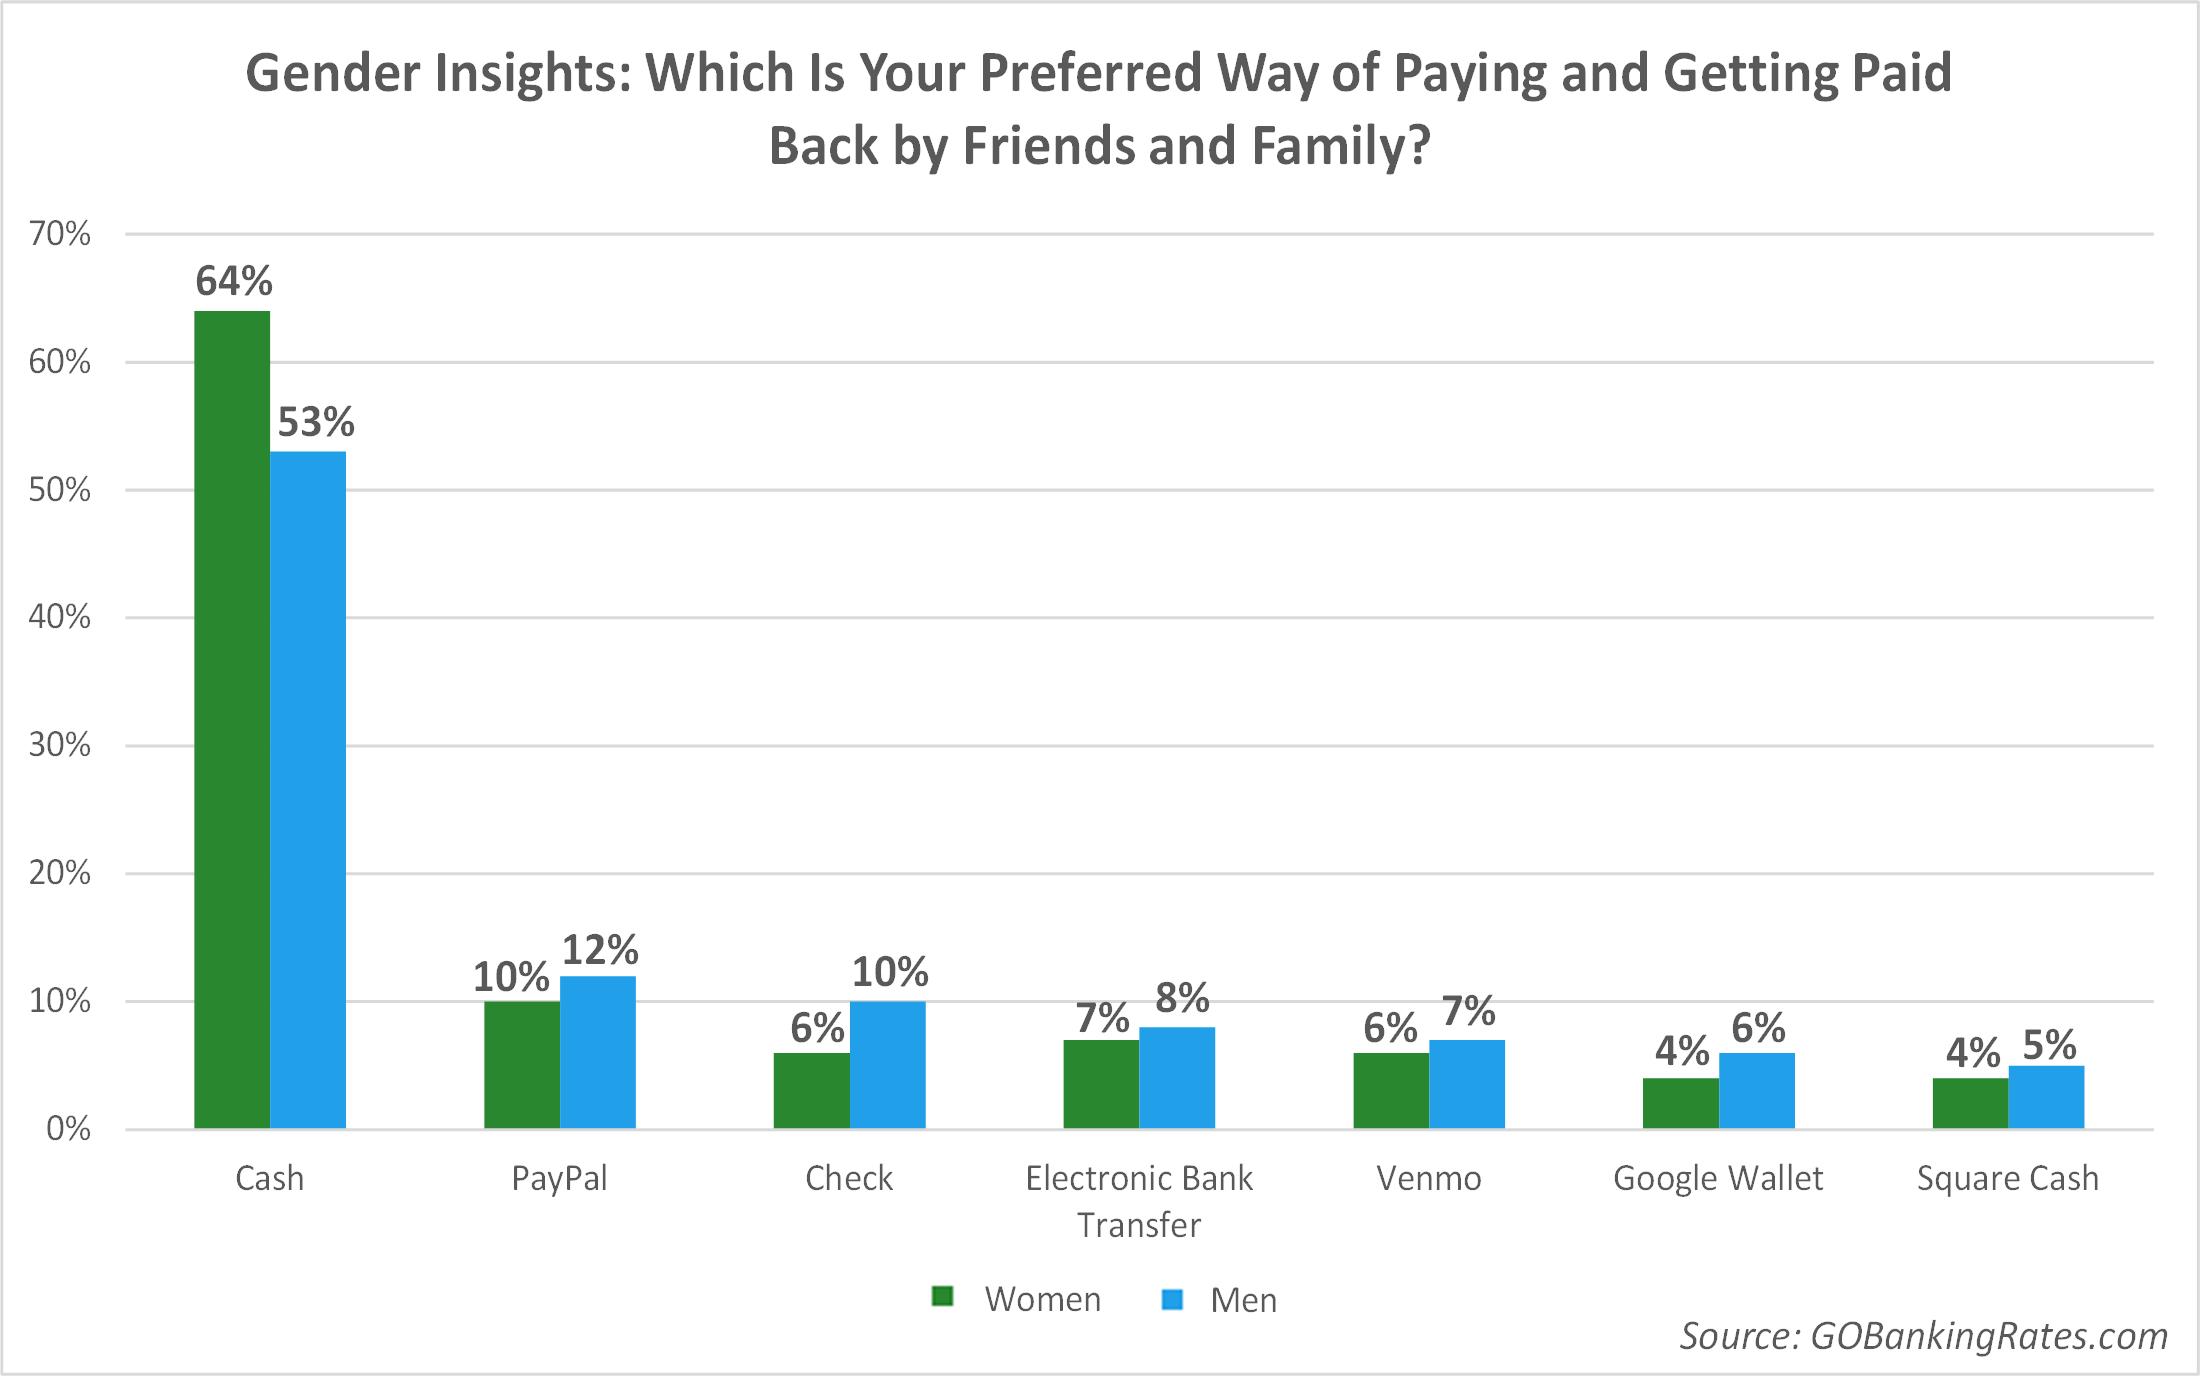 Gender Insights: Women Prefer Cash, Men Prefer Checks and P2P Apps